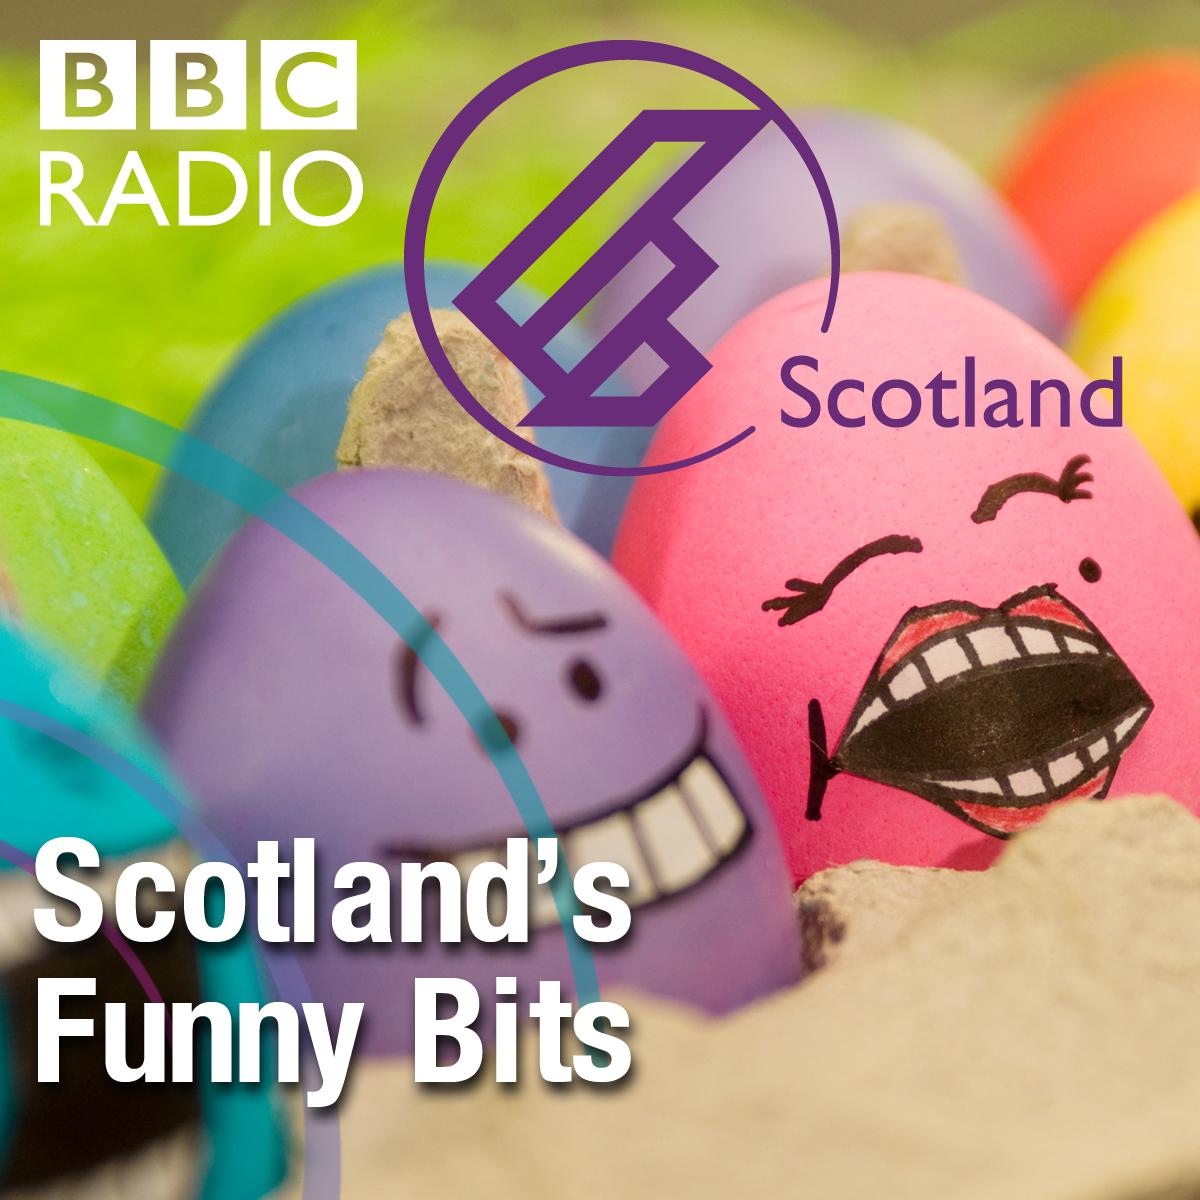 Scotland's Funny Bits